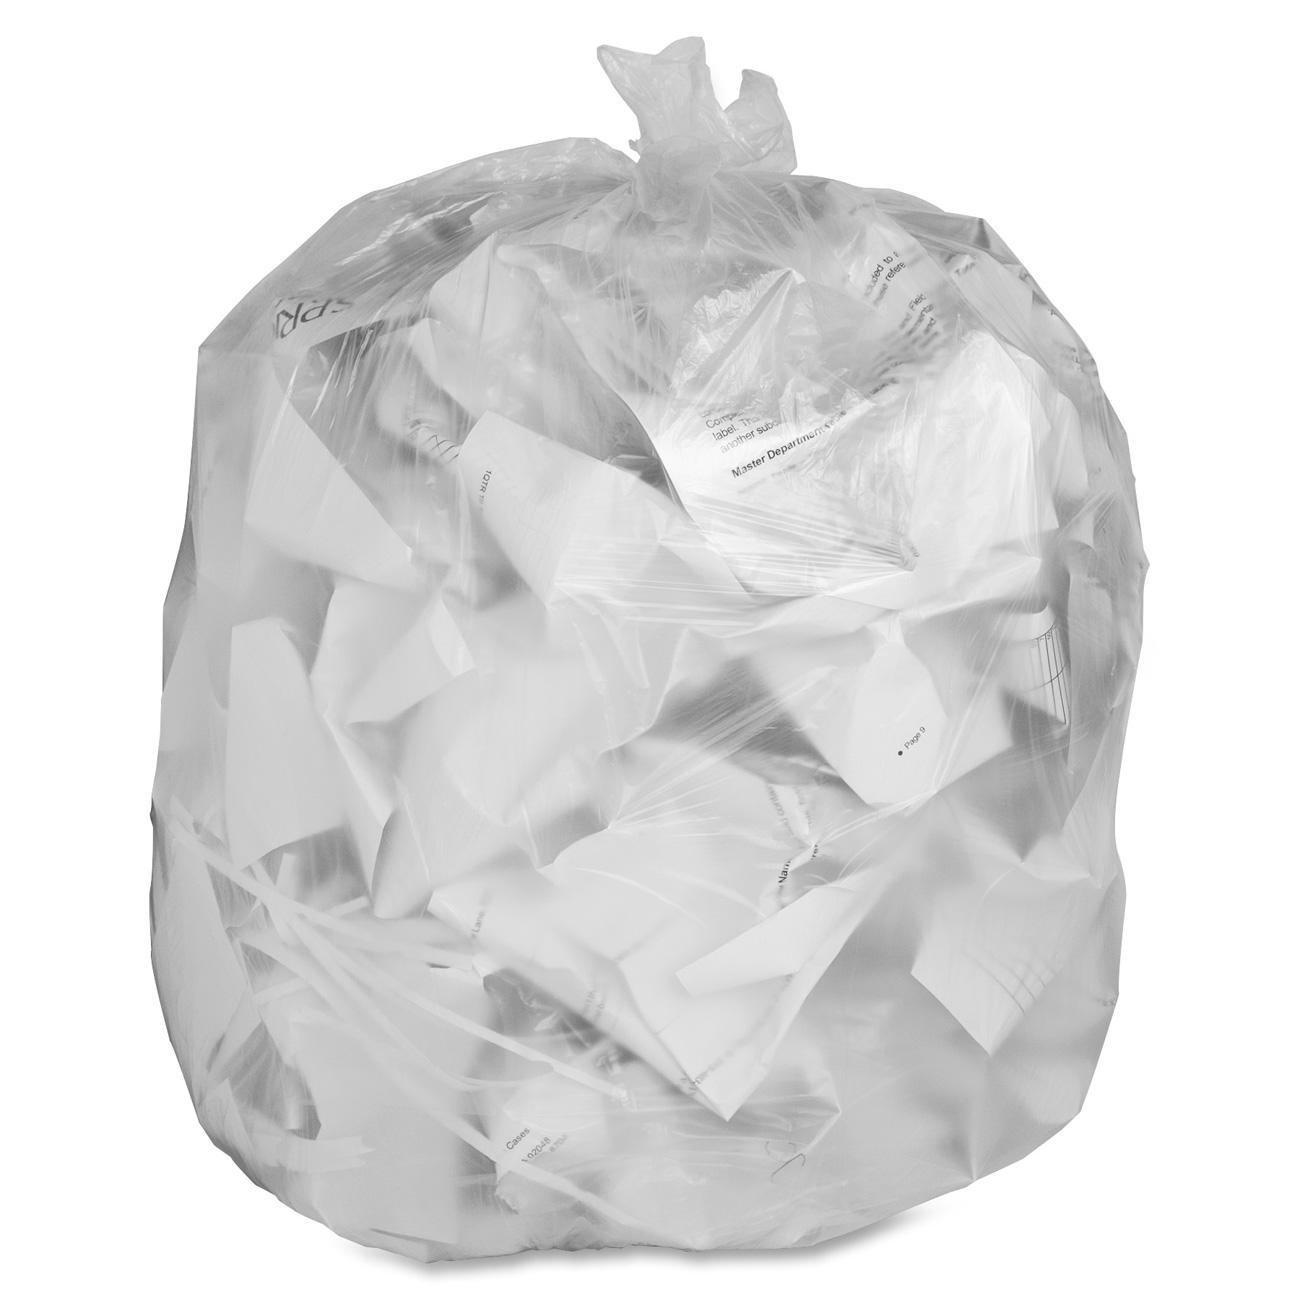 Genuine Joe Clear Trash Can Liners, 16 gal, 500/carton, GJO01011